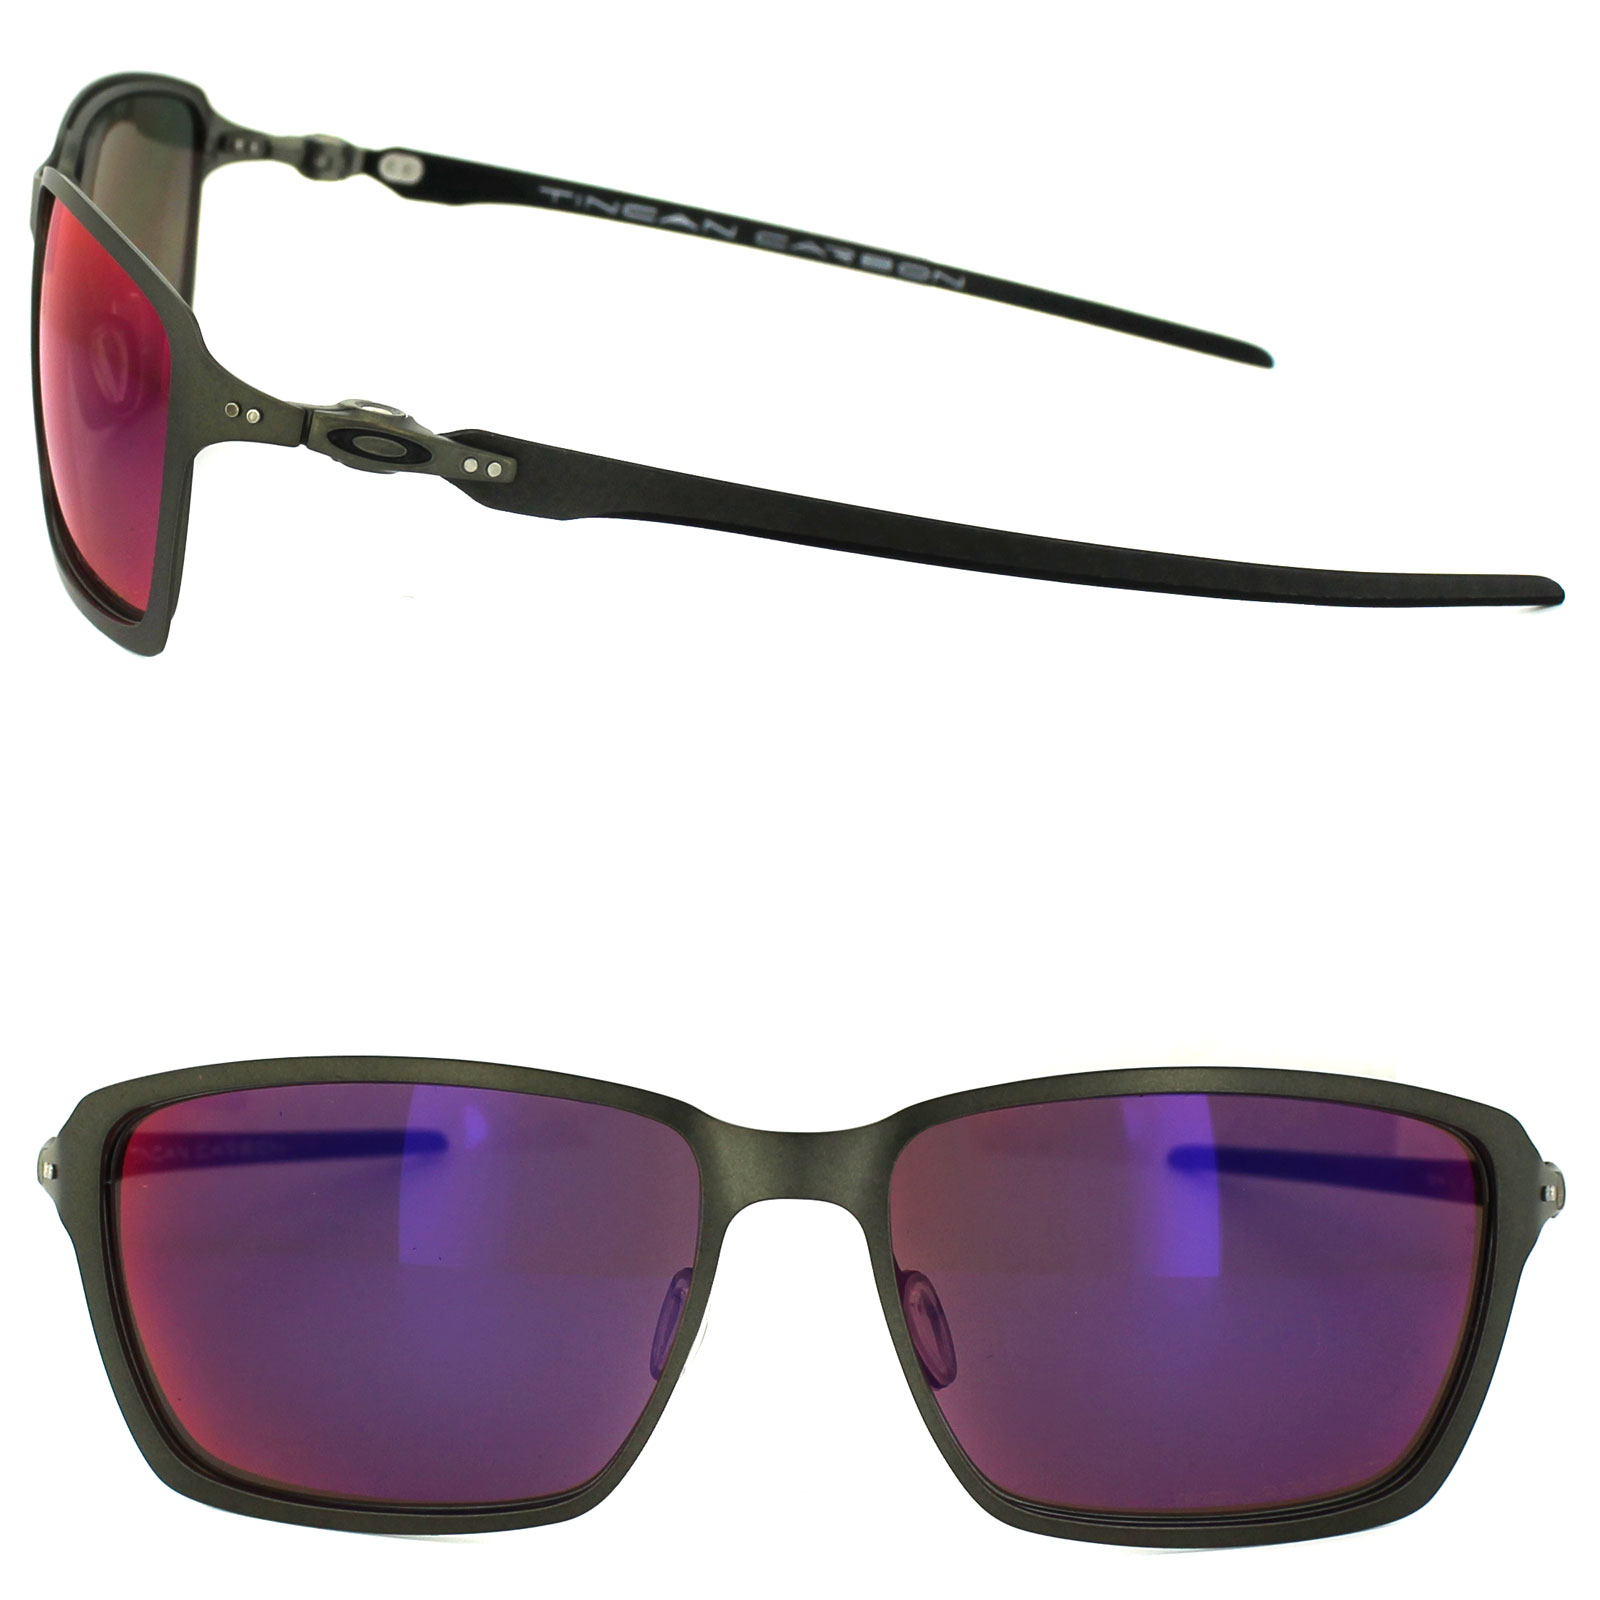 9872a407322 Oakley Tincan Carbon Sunglasses Thumbnail 1 Oakley Tincan Carbon Sunglasses  Thumbnail 2 ...